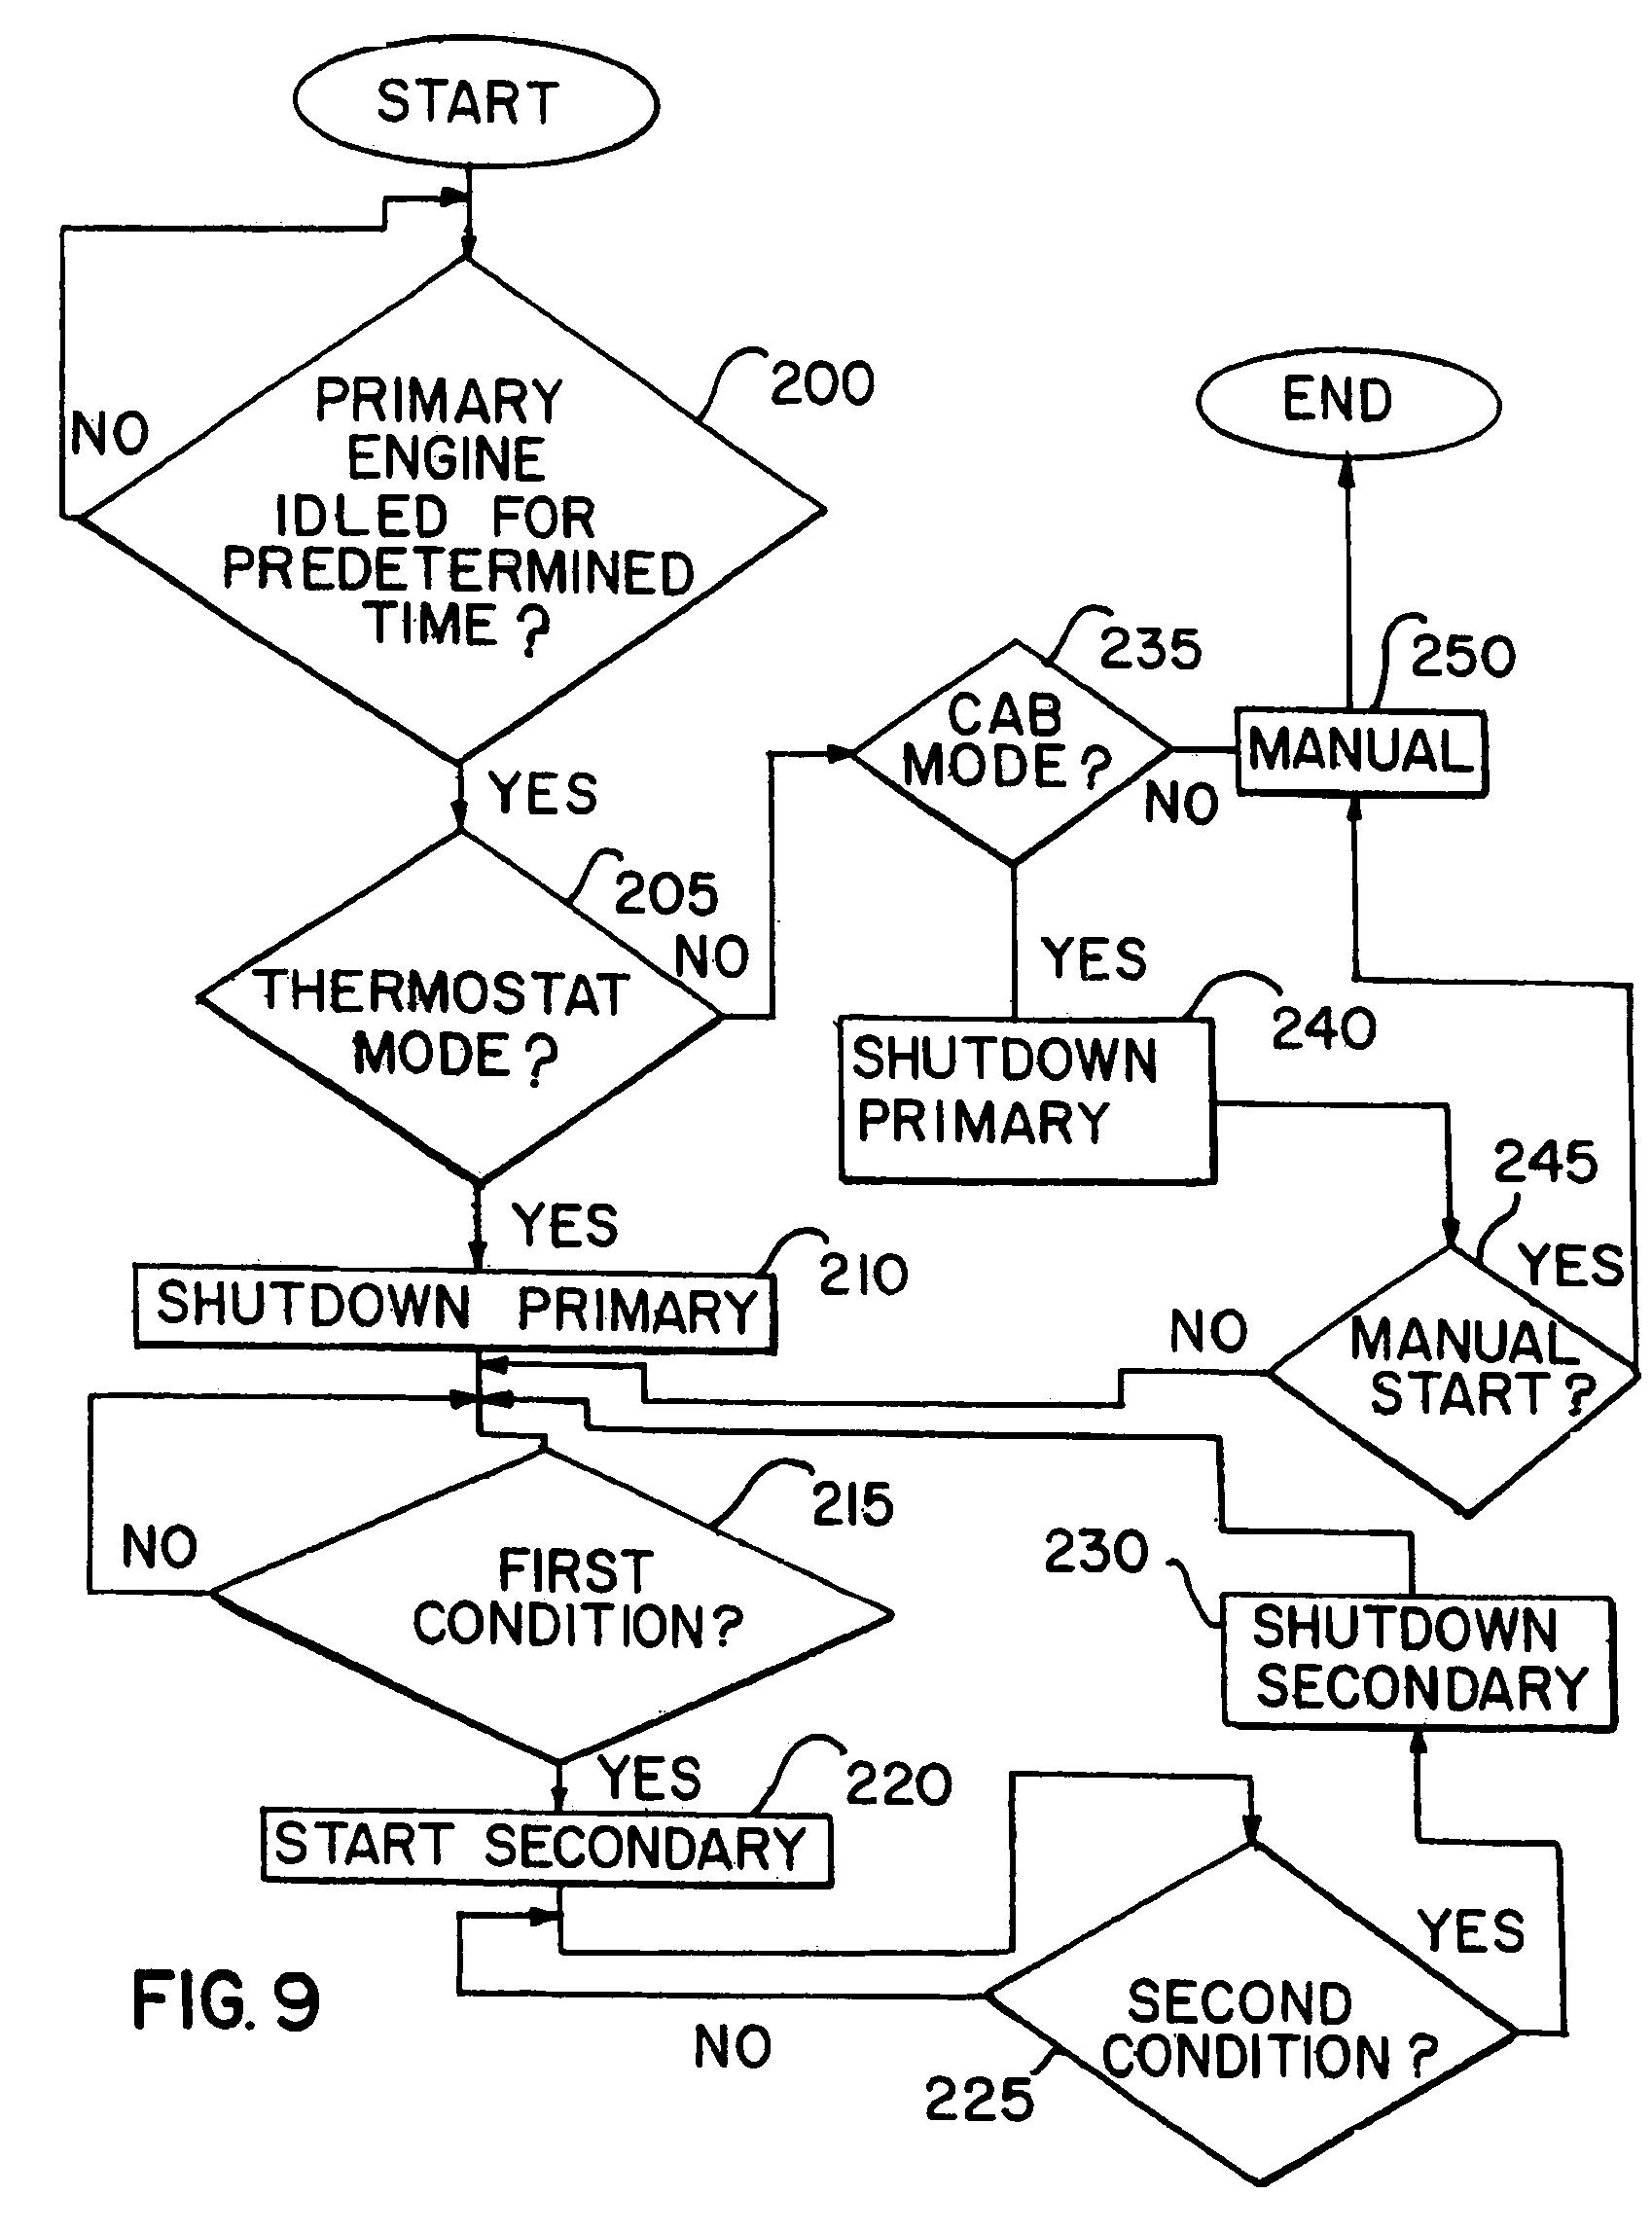 Copeland pressor wiring diagram images diagram furthermore wiring diagram